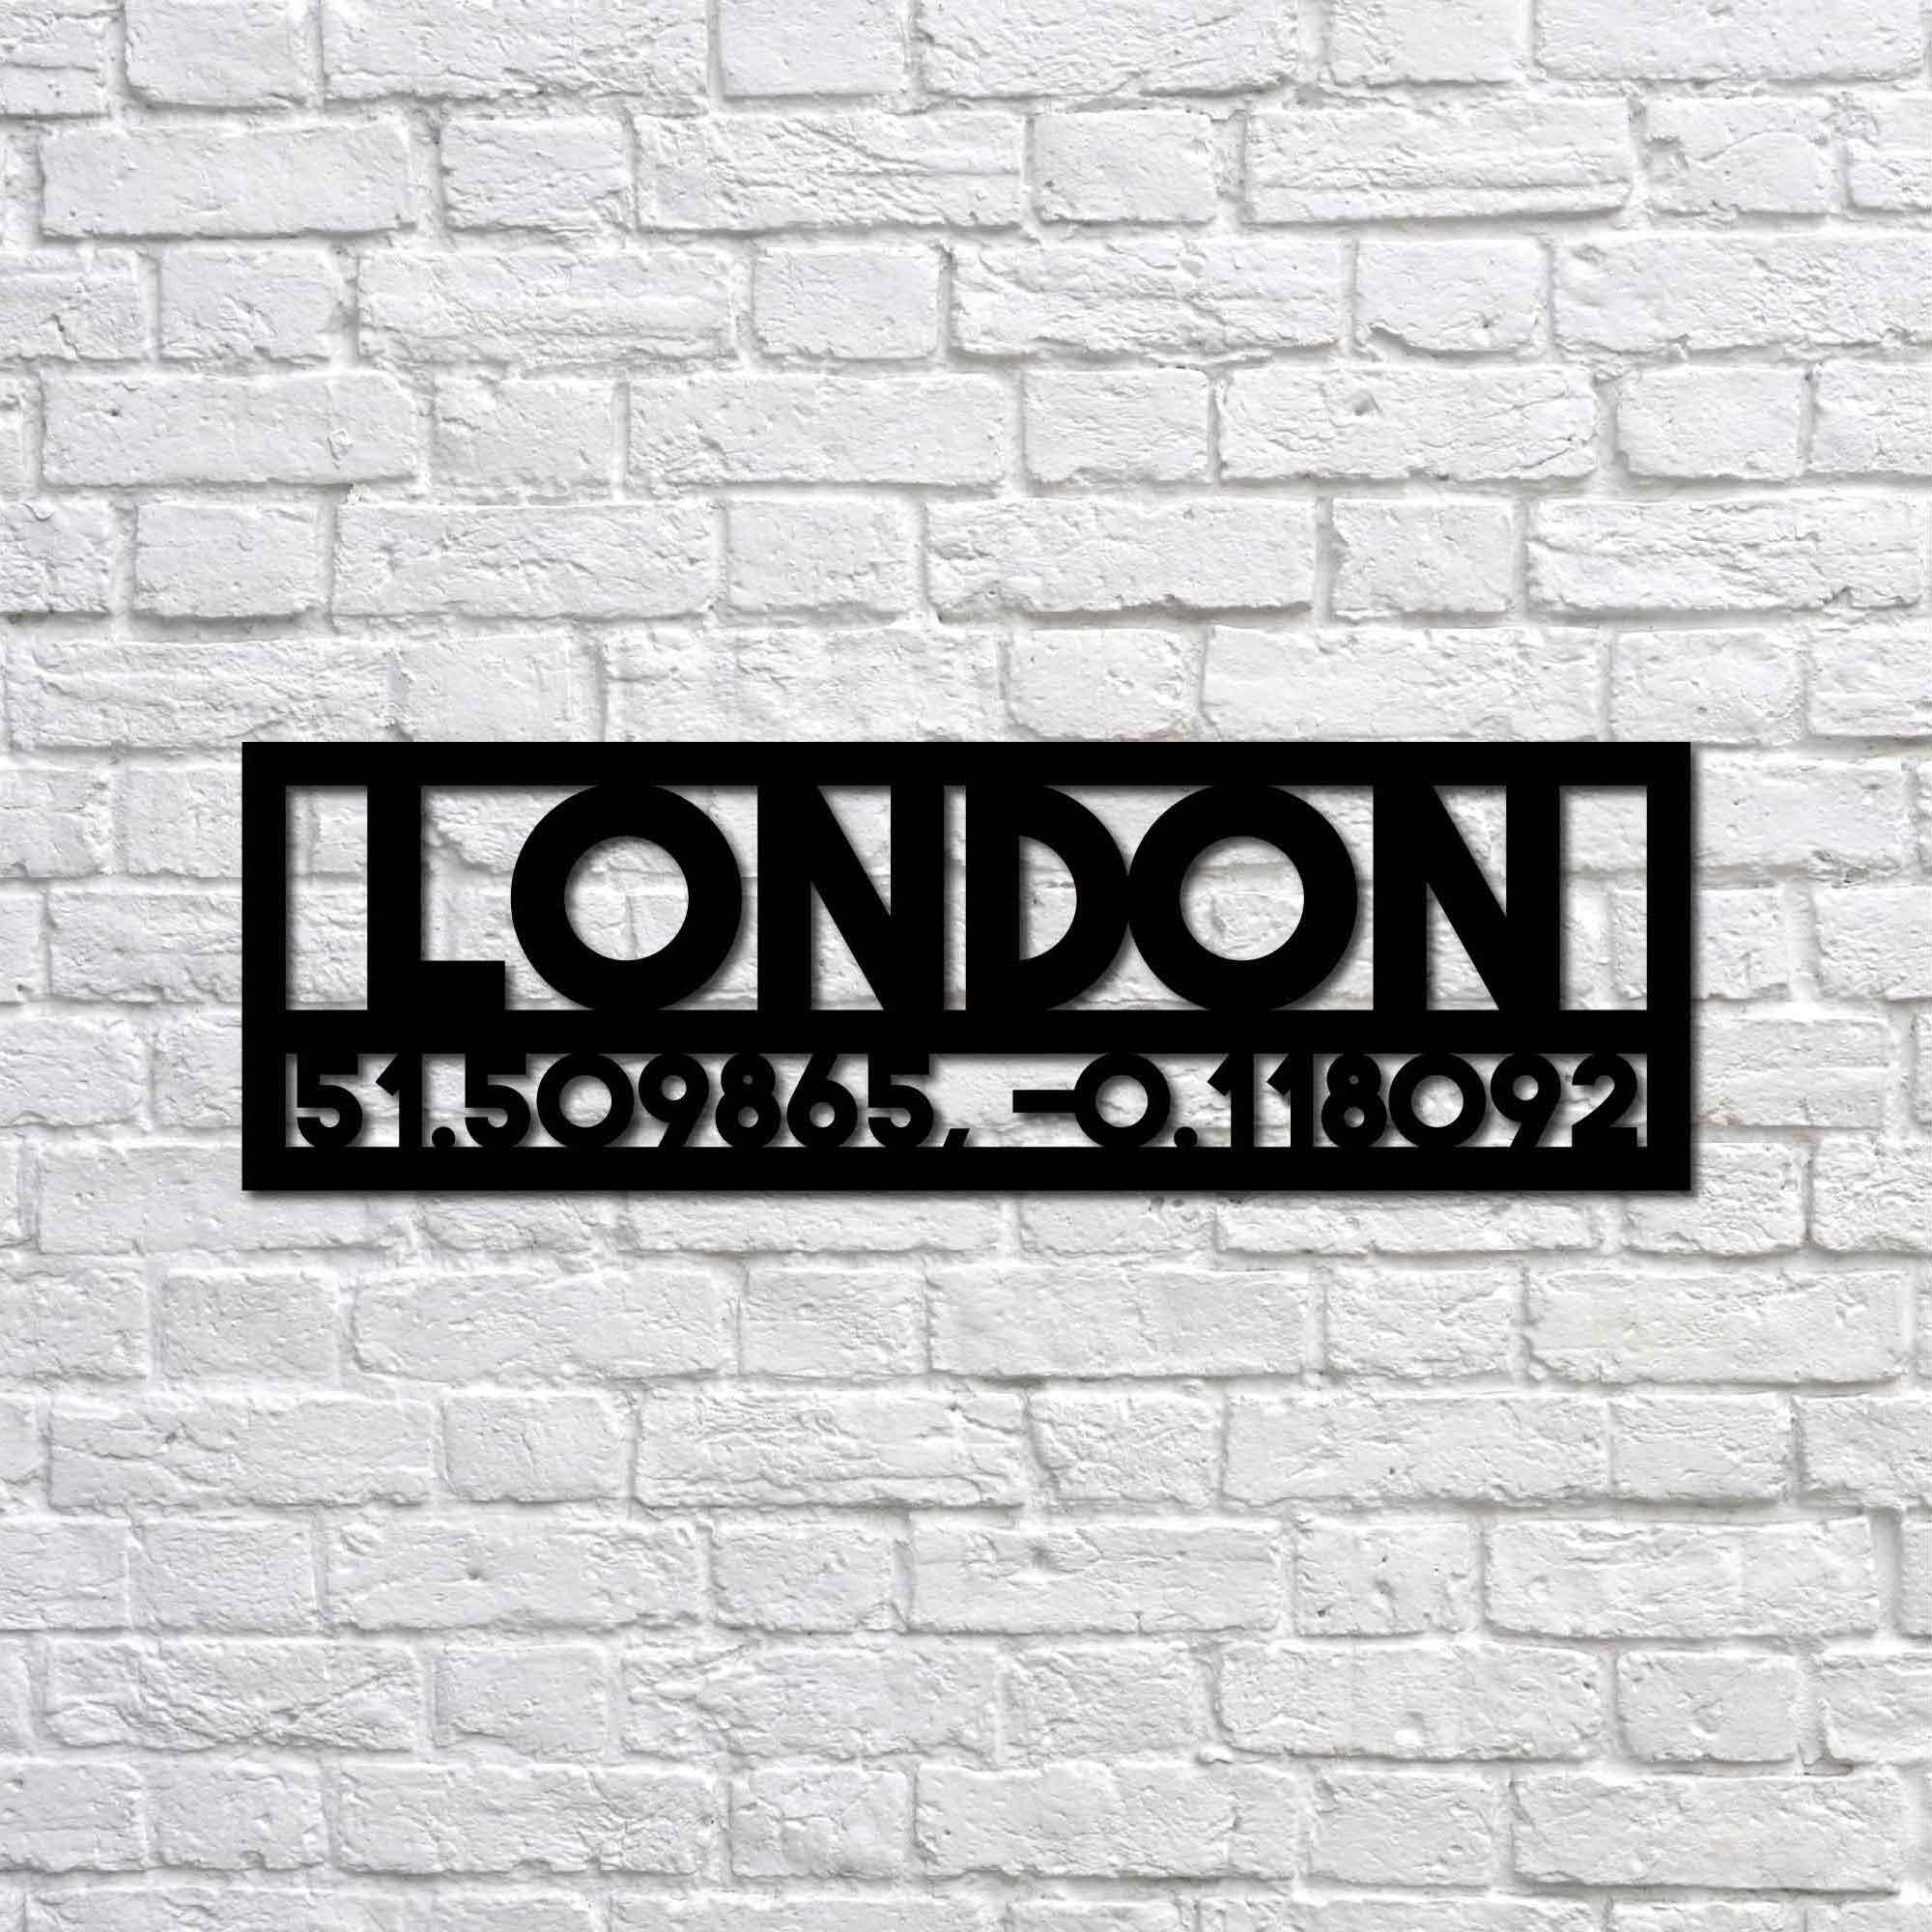 London and Coordinates – Metal Wall Art